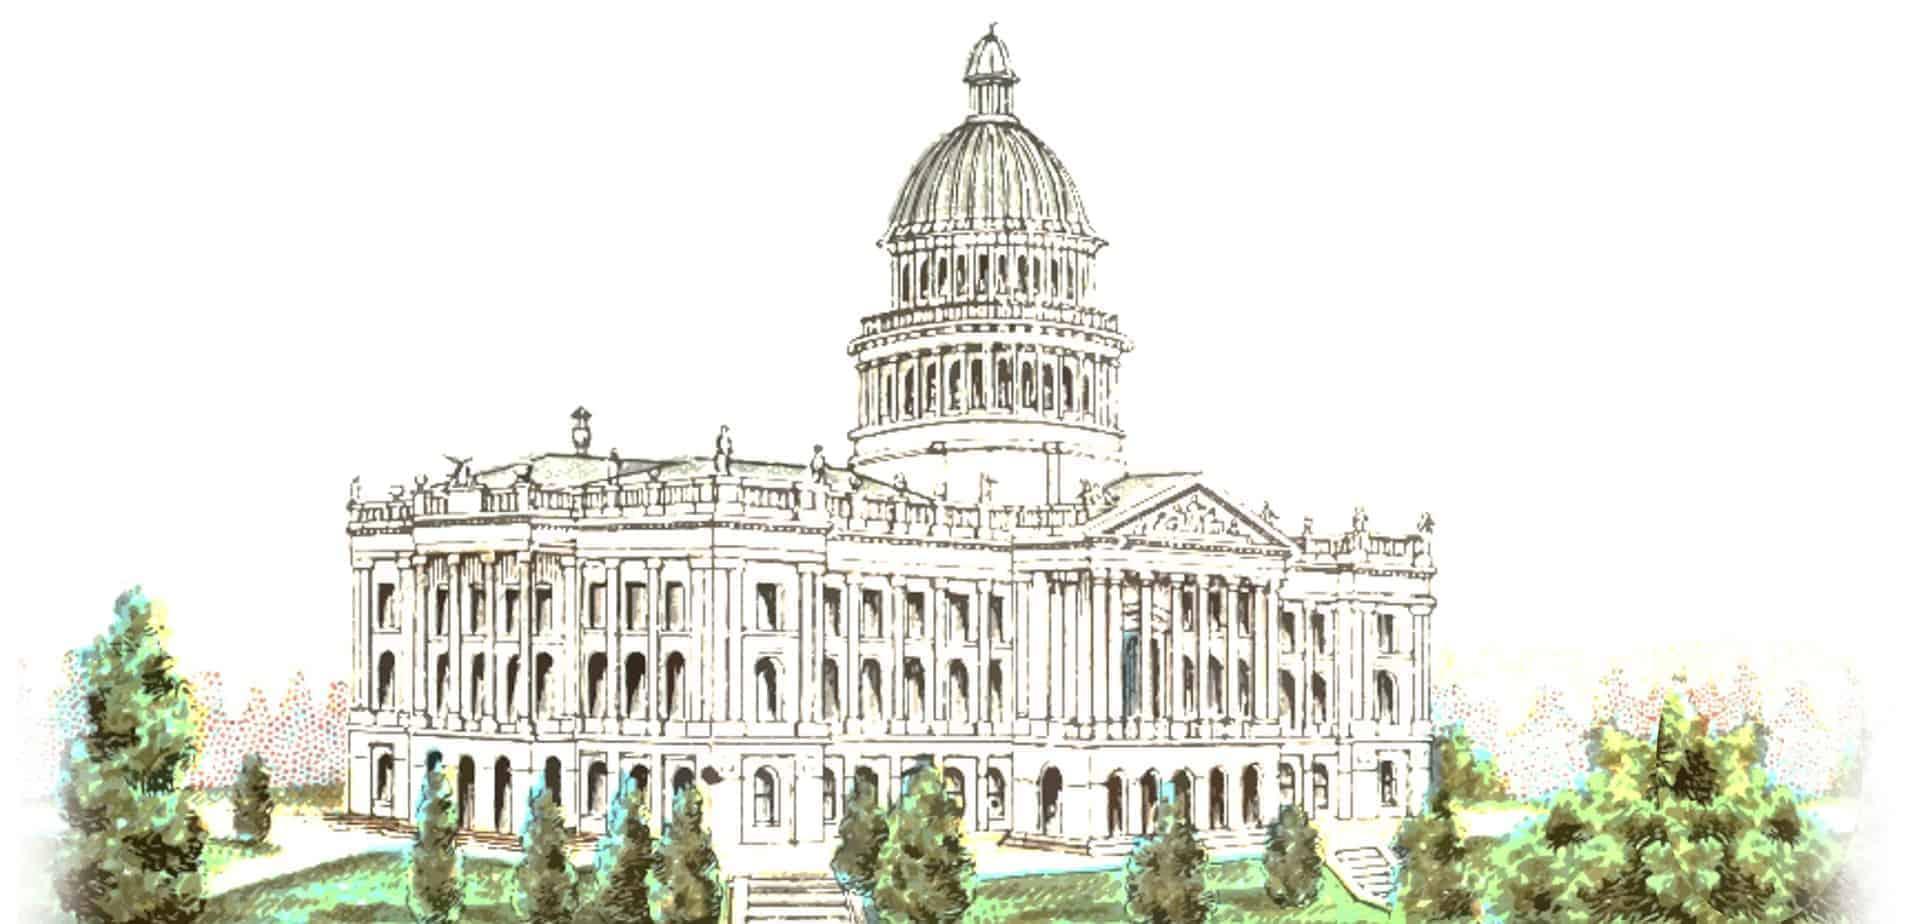 California Capitol - CCPA